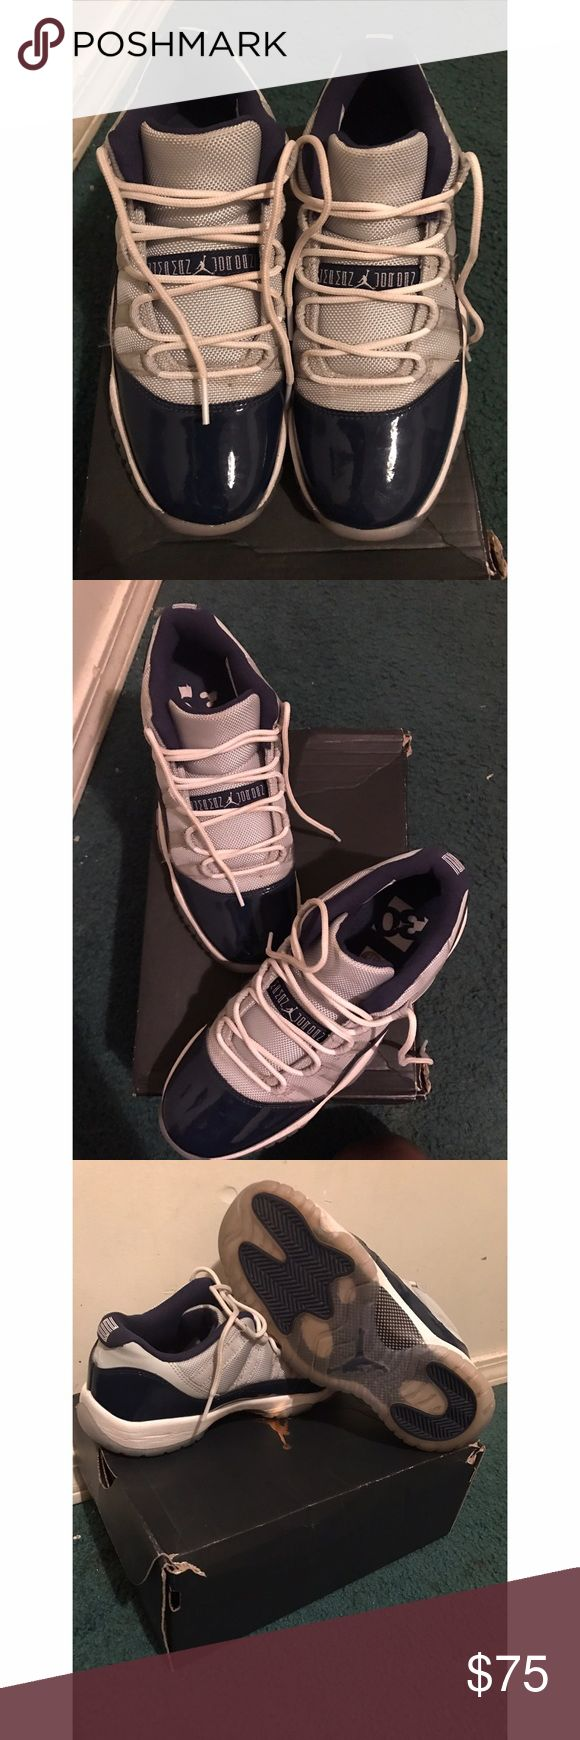 Air Jordan Retro 11 Low Top I'm great shape only worn 3 times . Jordan Shoes Sneakers